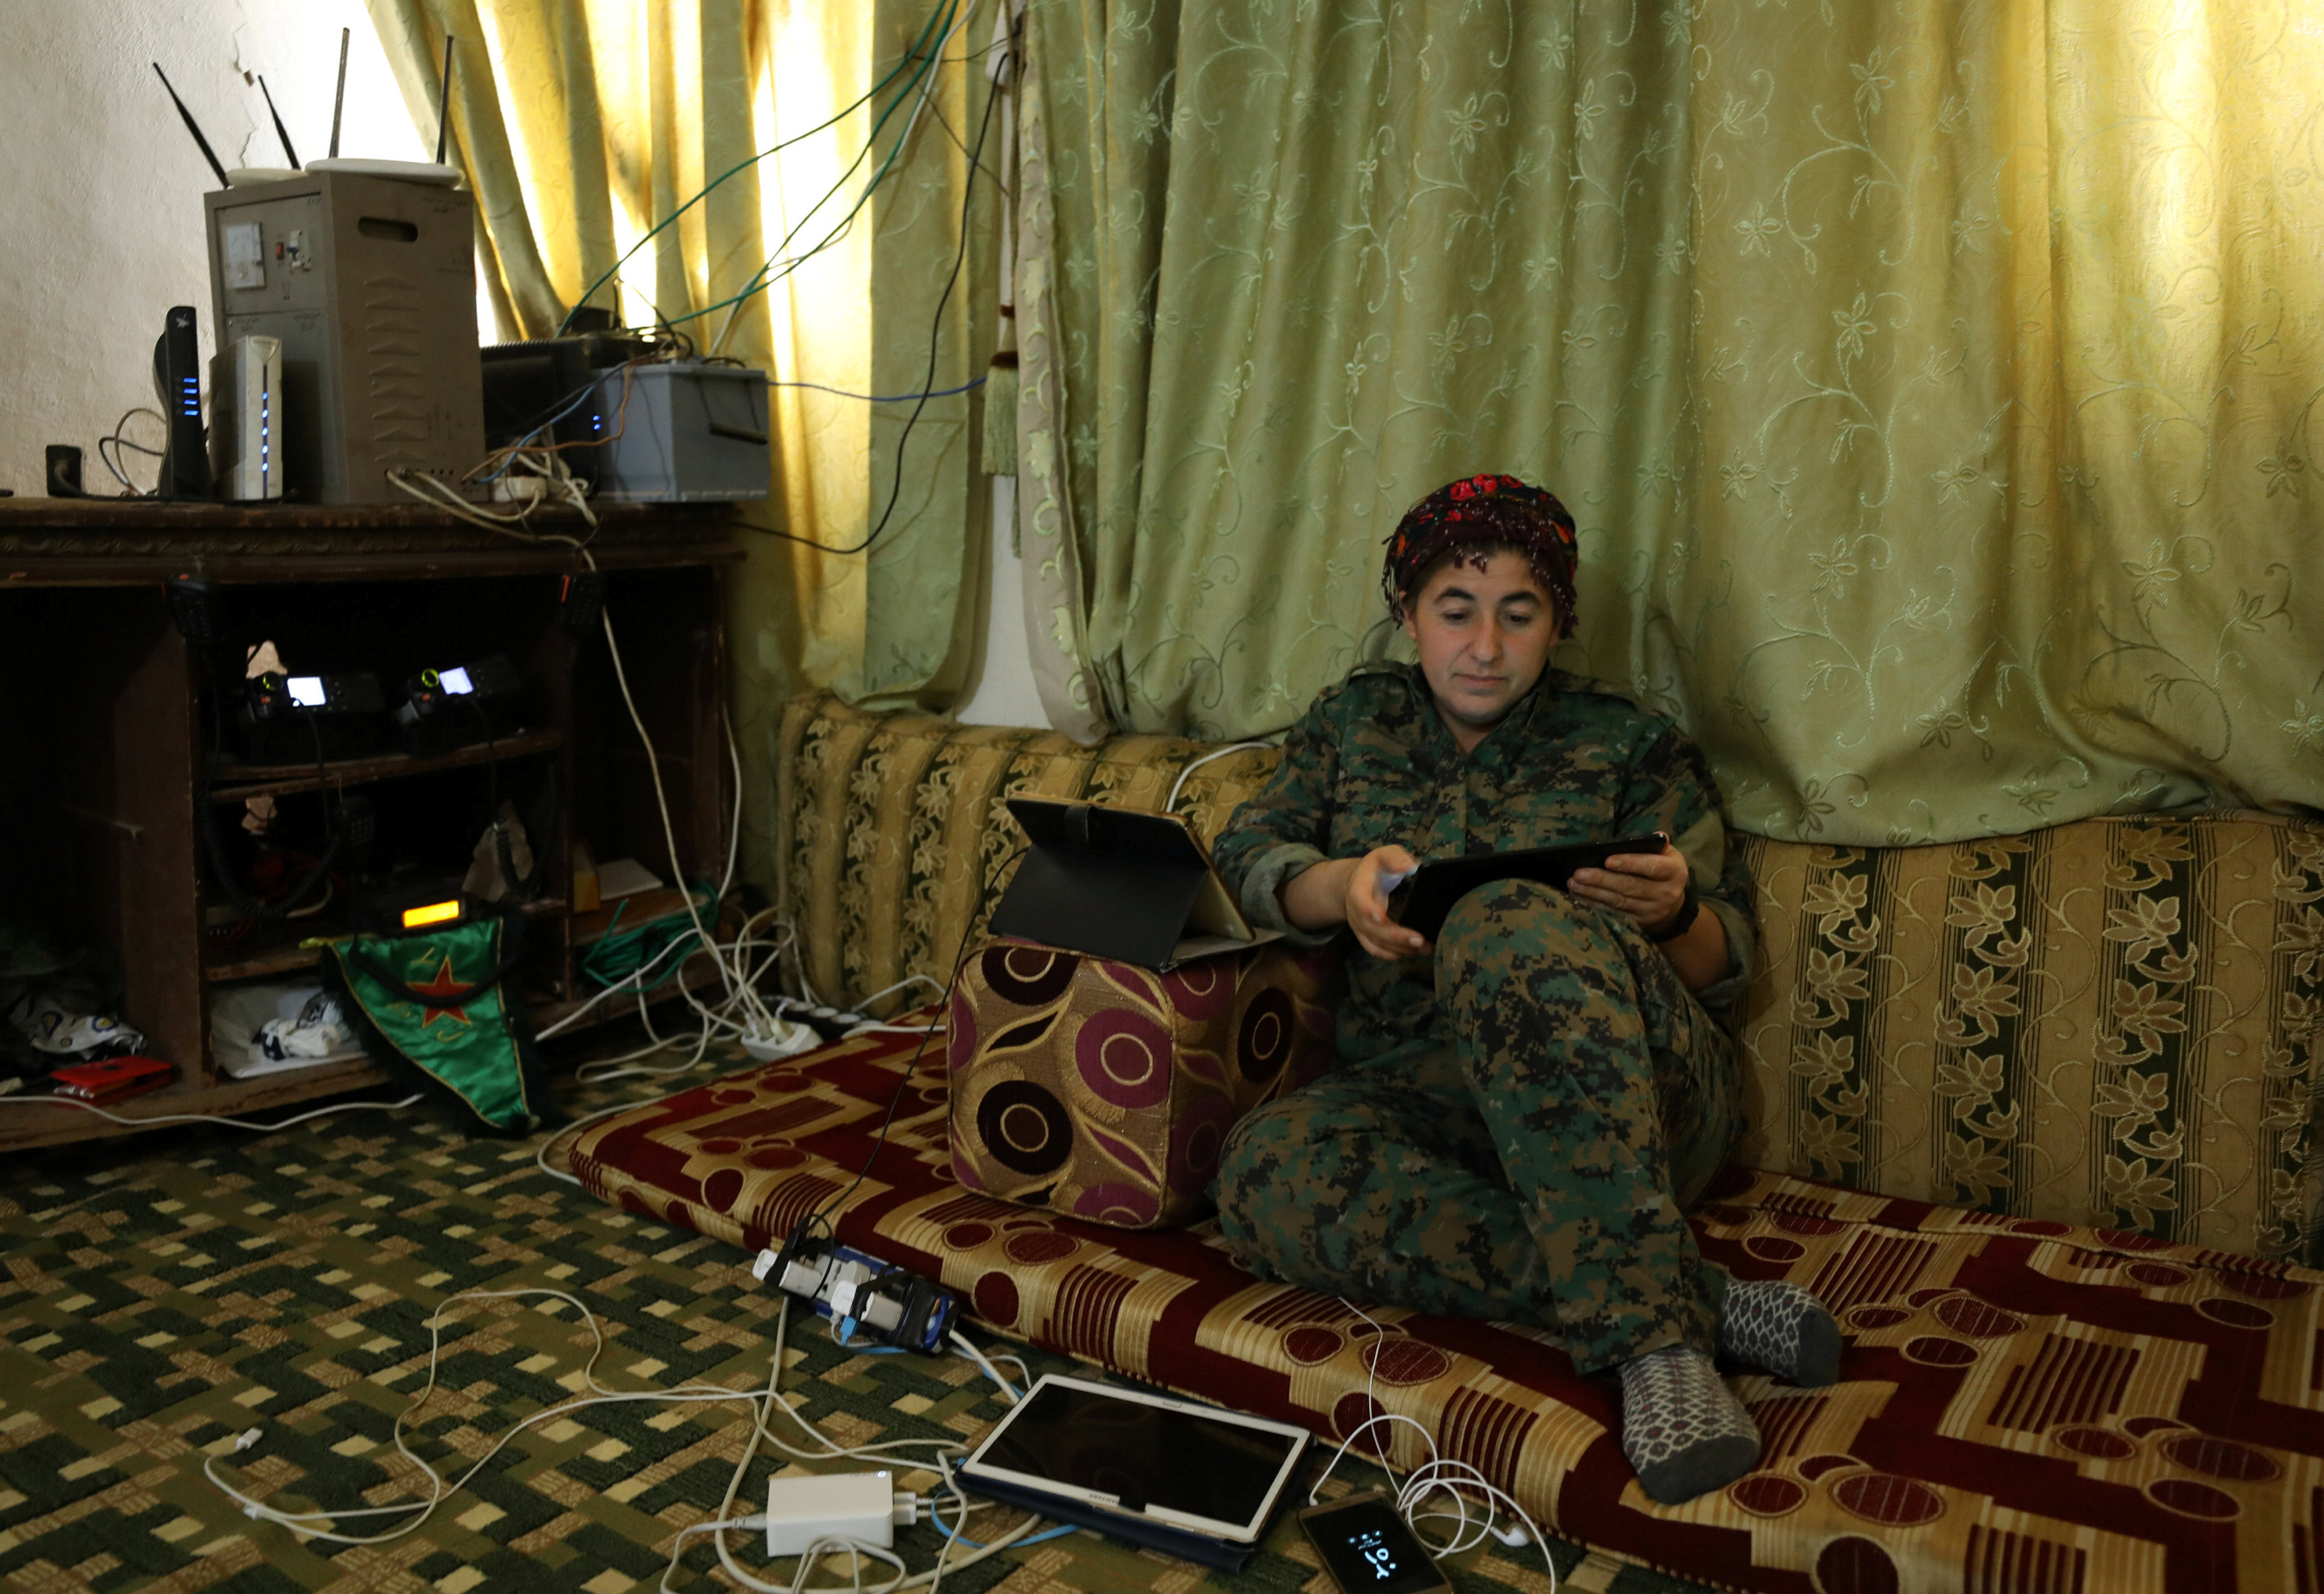 U.S.-backed Raqqa battle should end in two months: Syria rebel commander